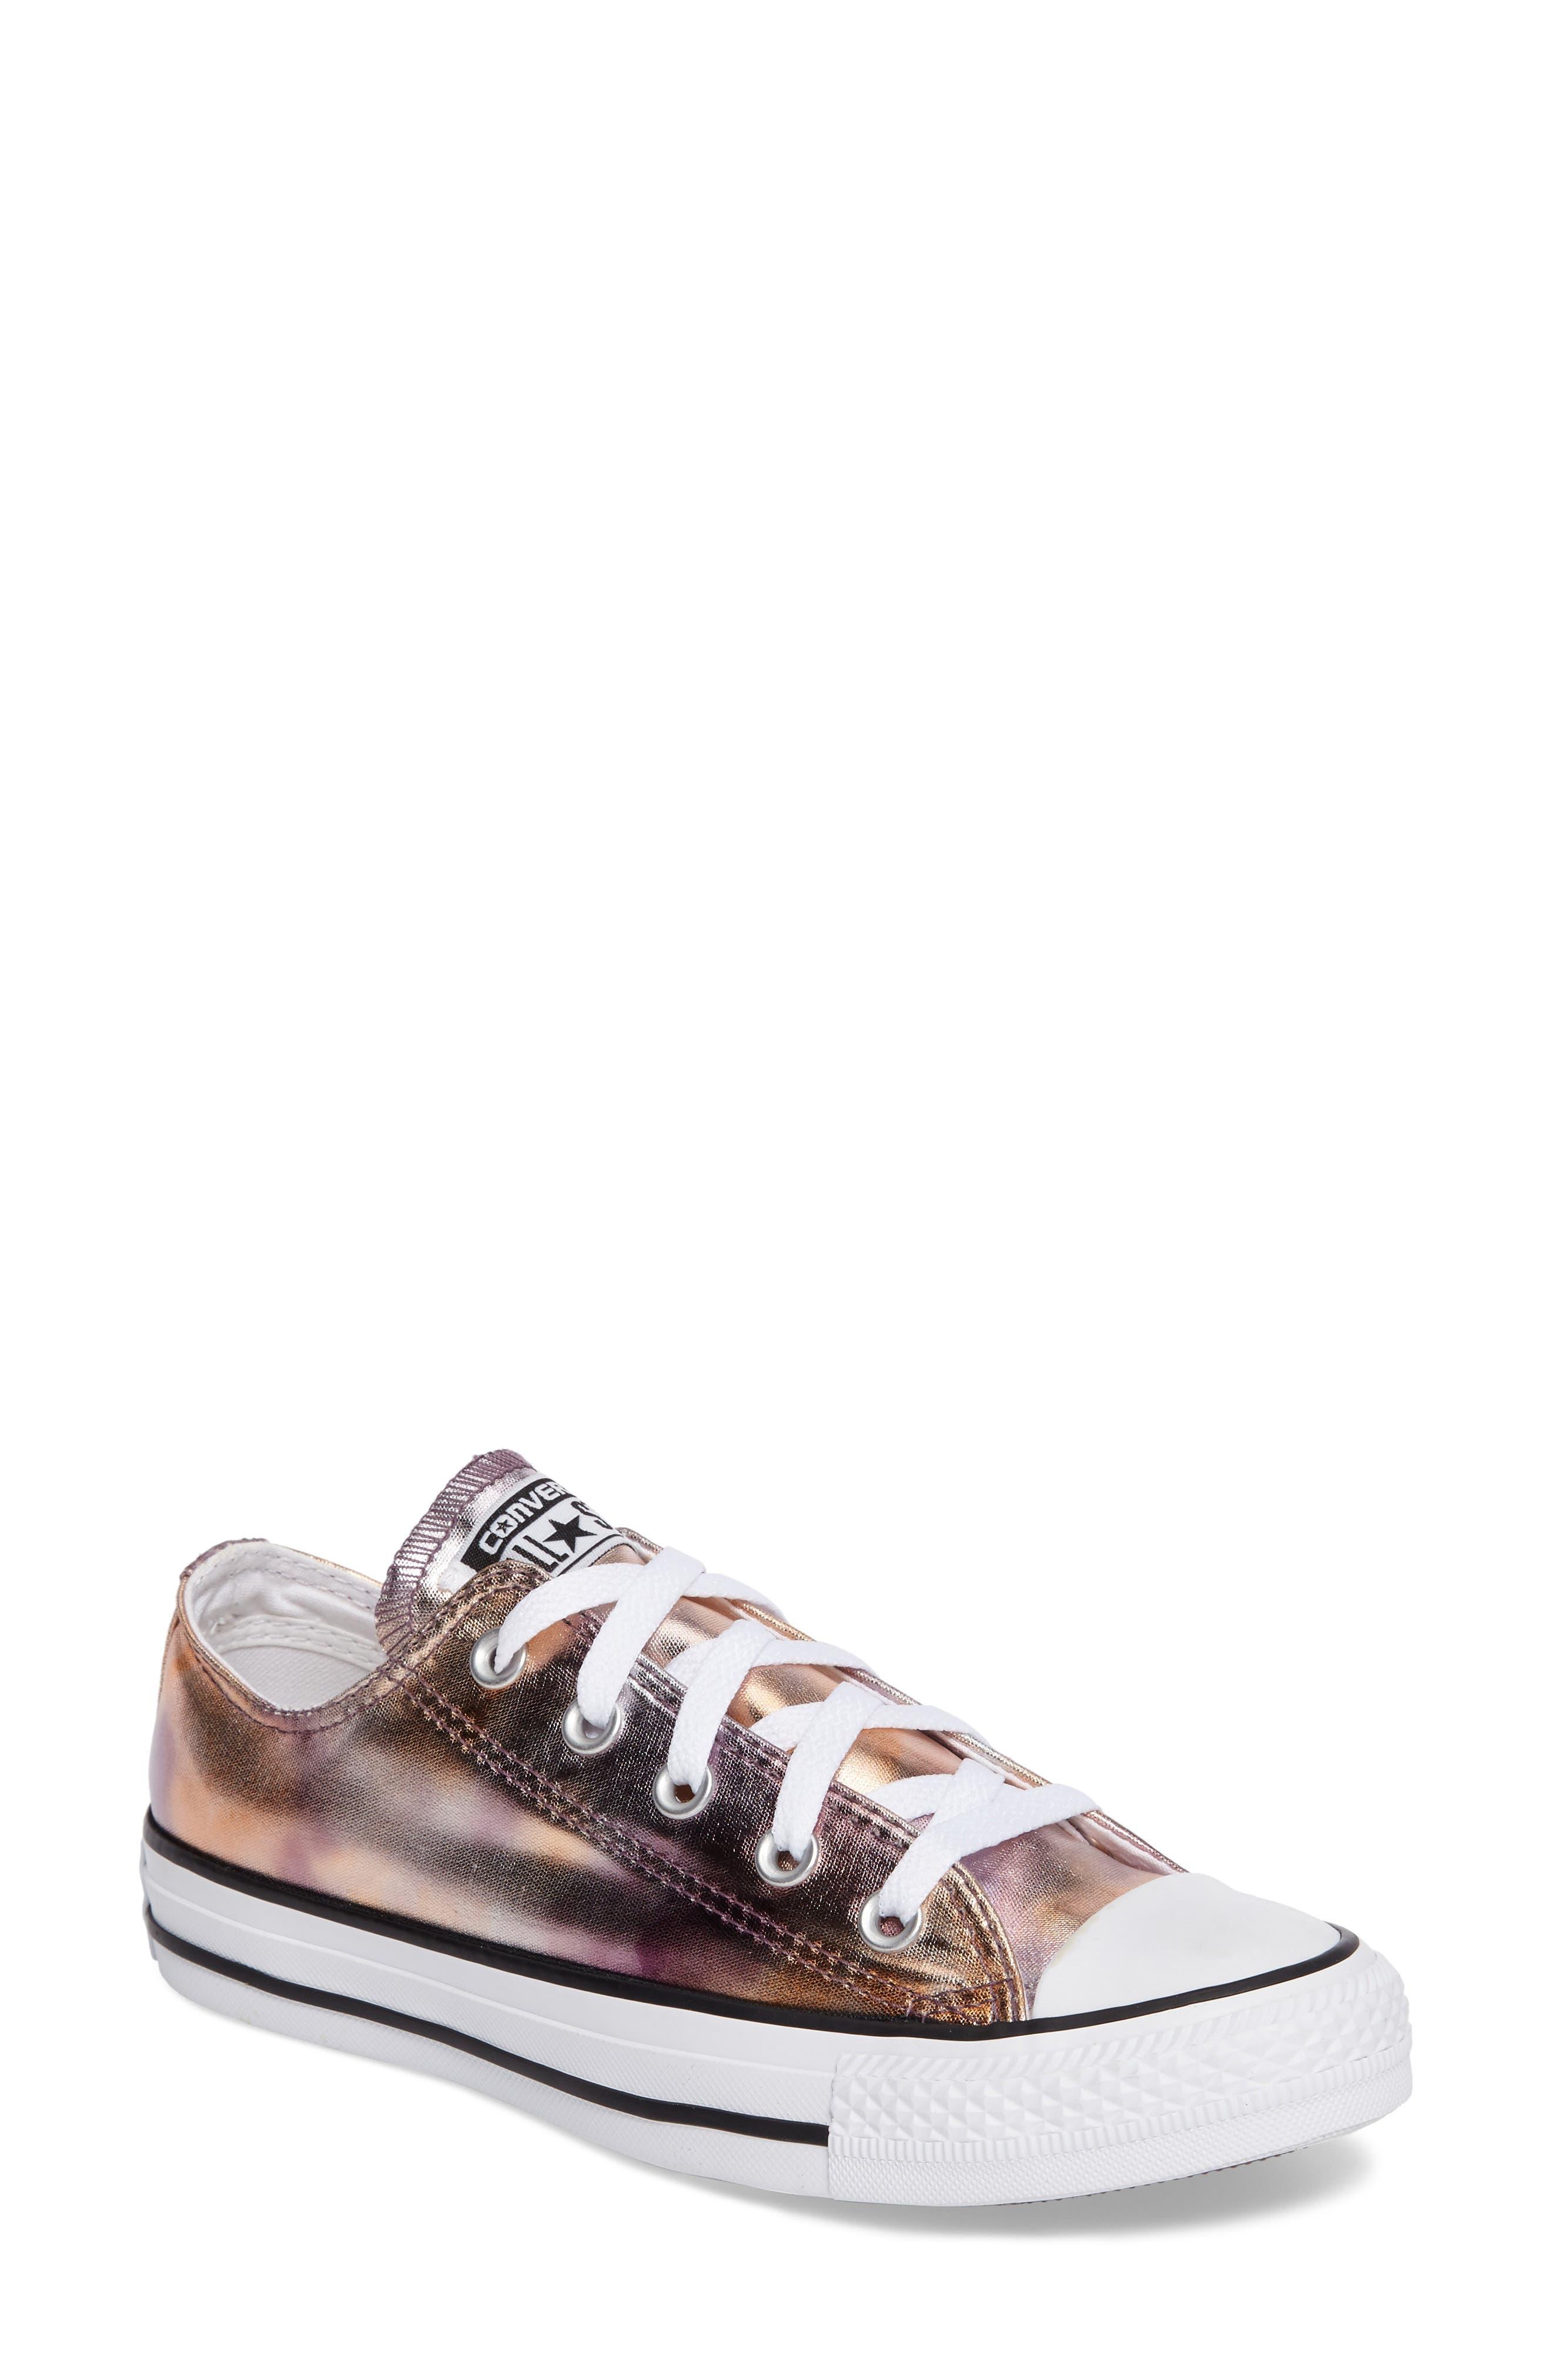 Chuck Taylor<sup>®</sup> All Star<sup>®</sup> Seasonal Metallic Ox Low Top Sneaker,                         Main,                         color, Dusk Pink